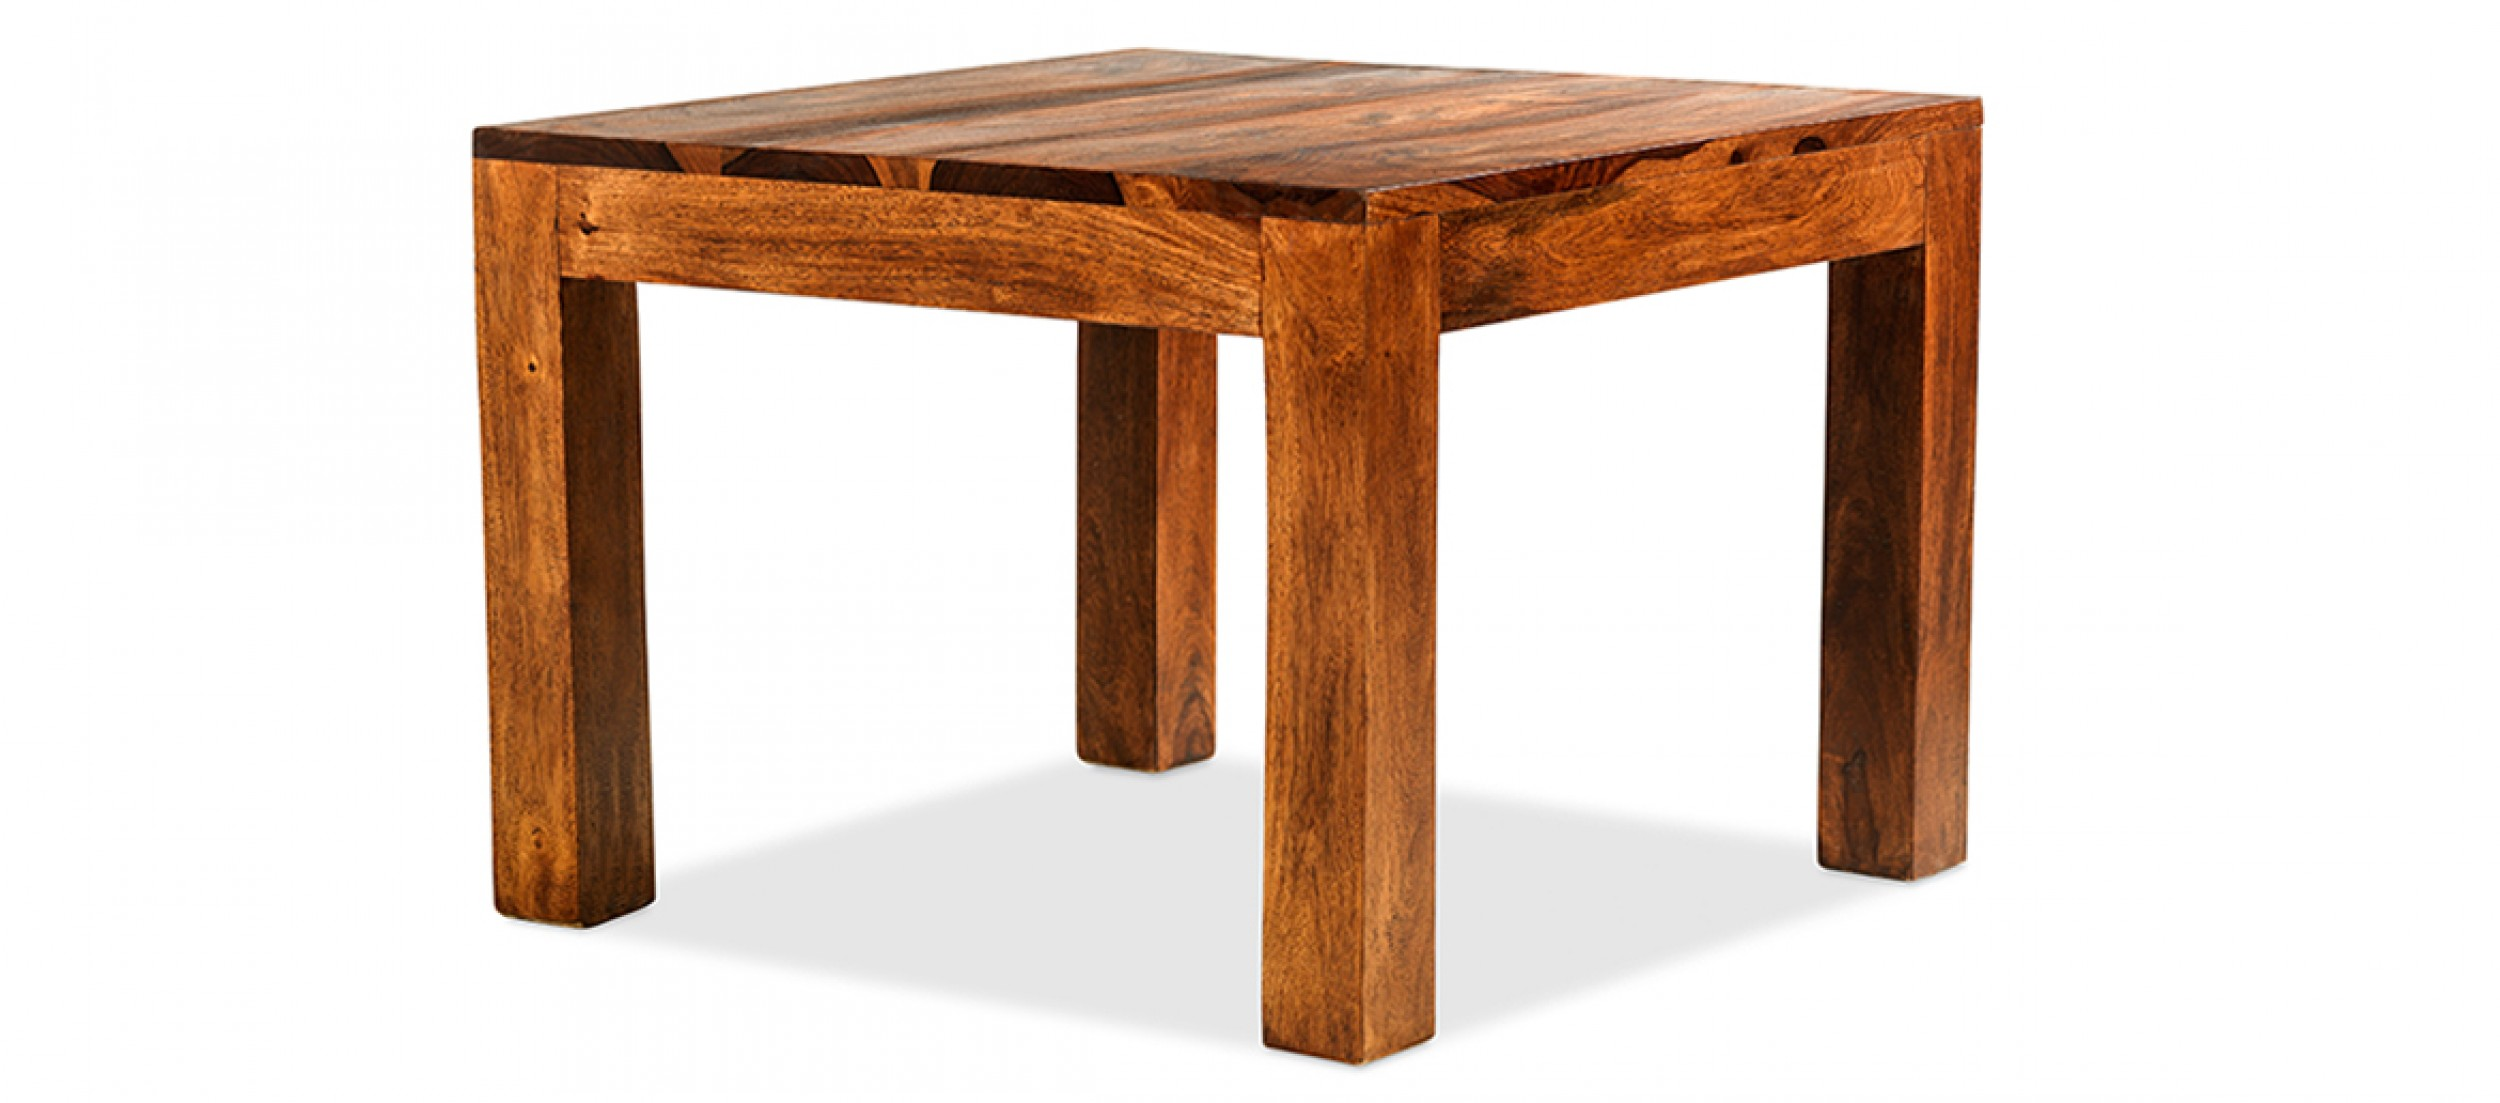 Cube sheesham 60 cm coffee table quercus living - Table largeur 60 cm ...